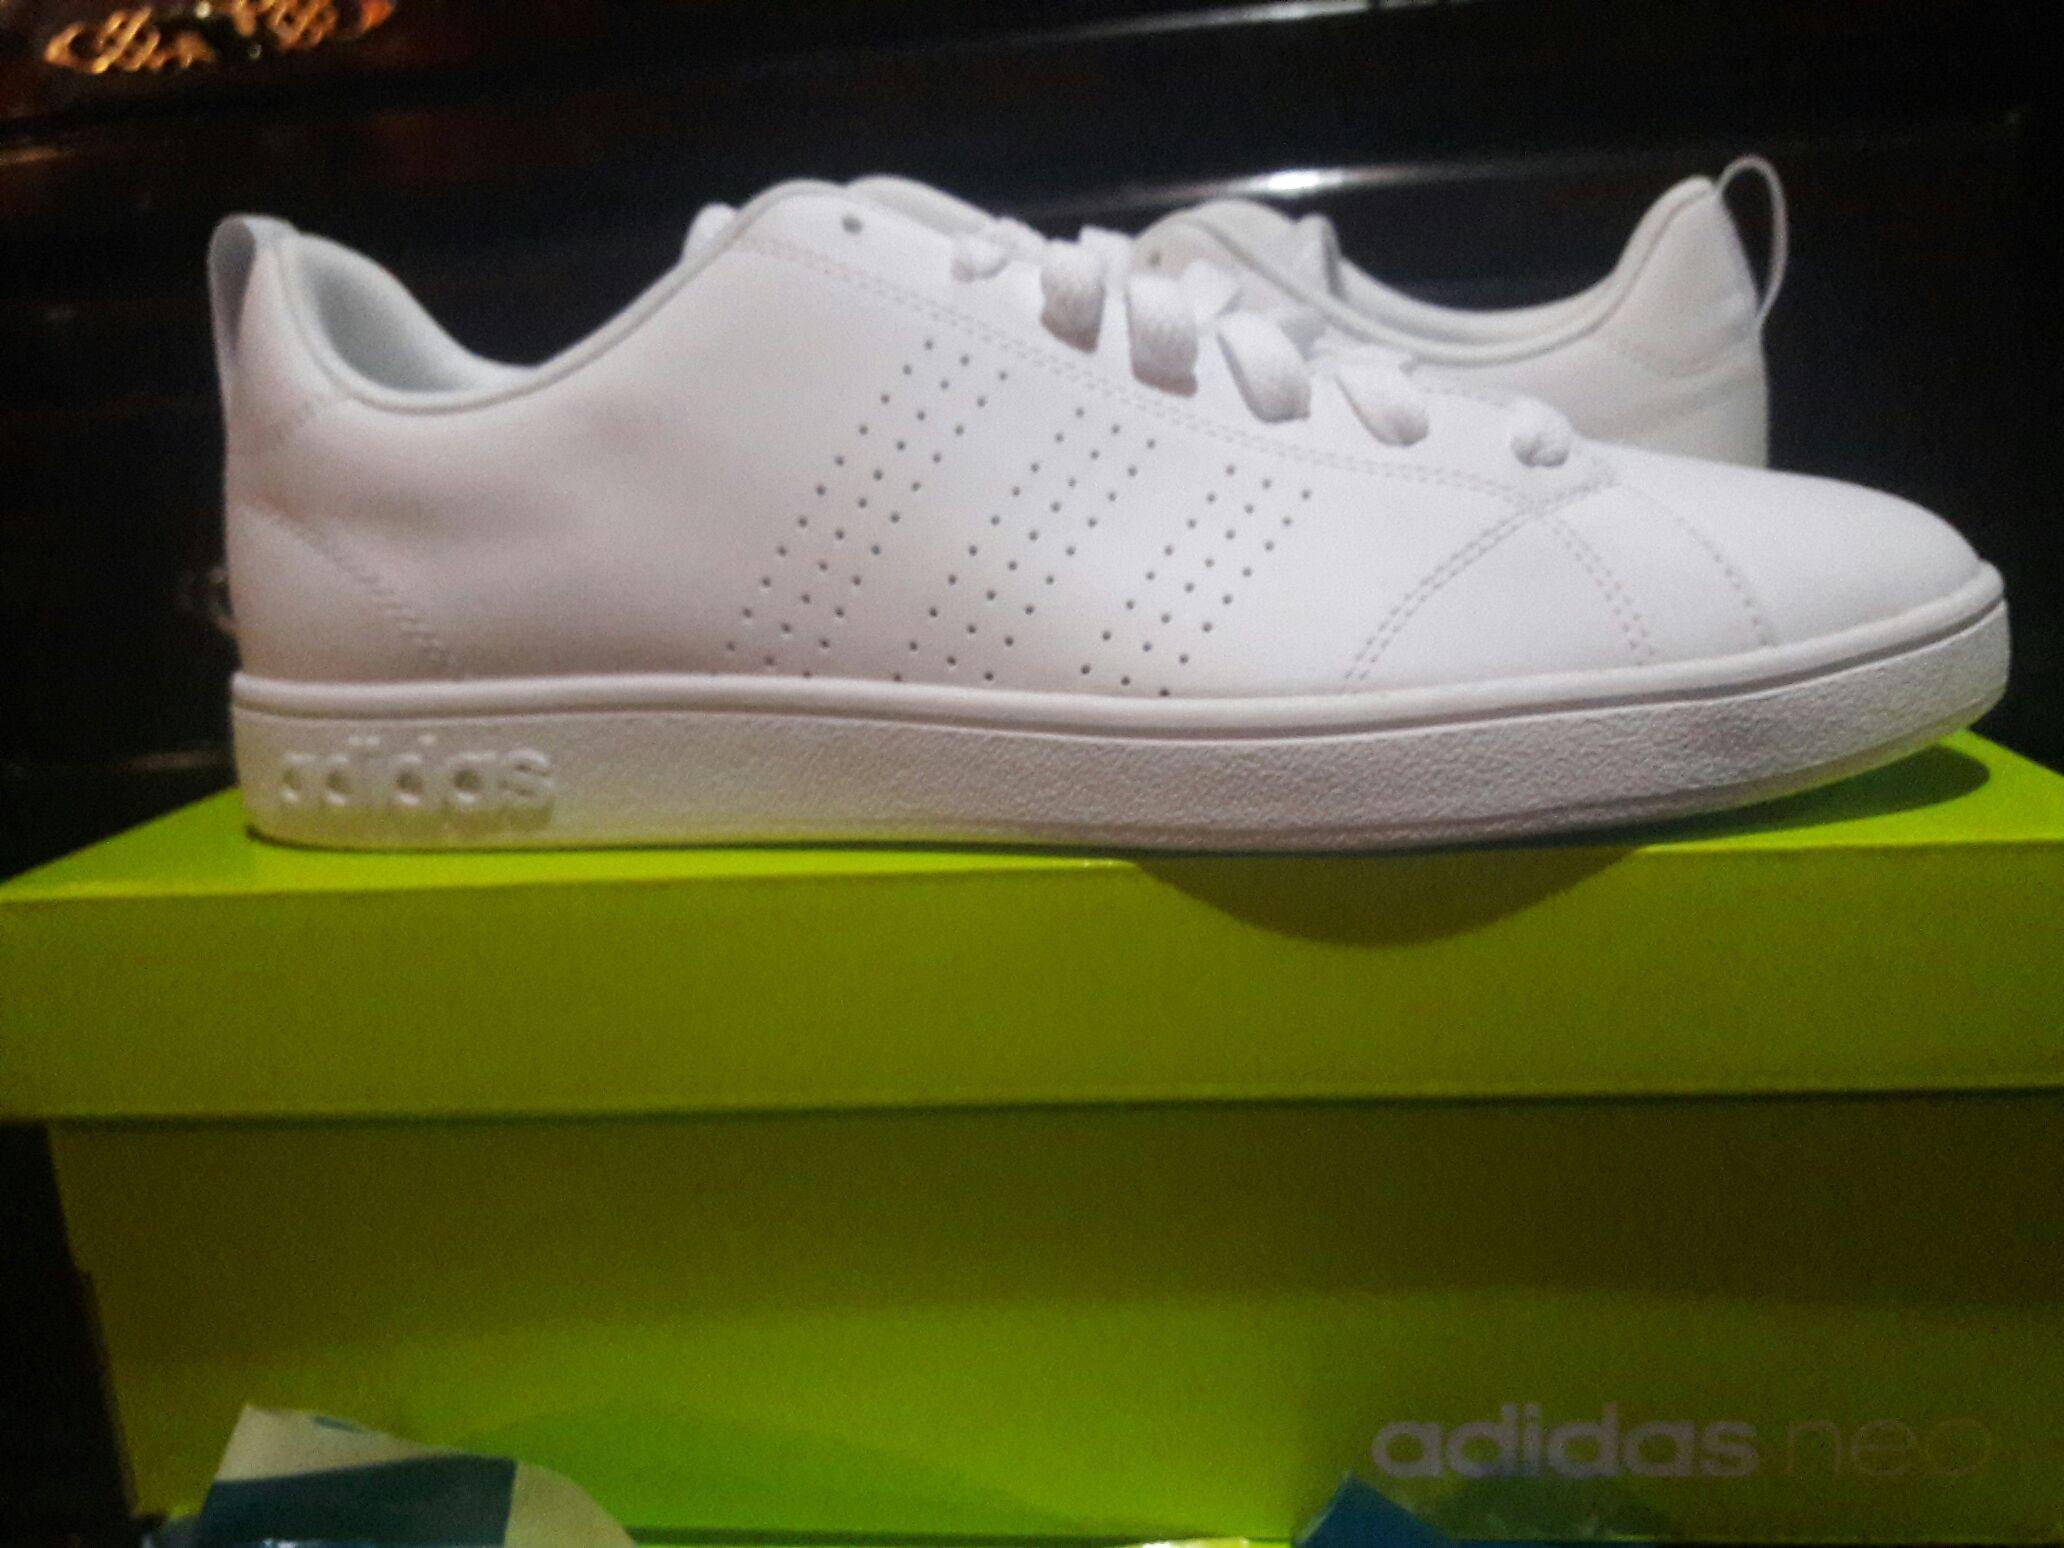 Mistertennis: Tenis Adidas Neo VS Advantage clean (hombre)